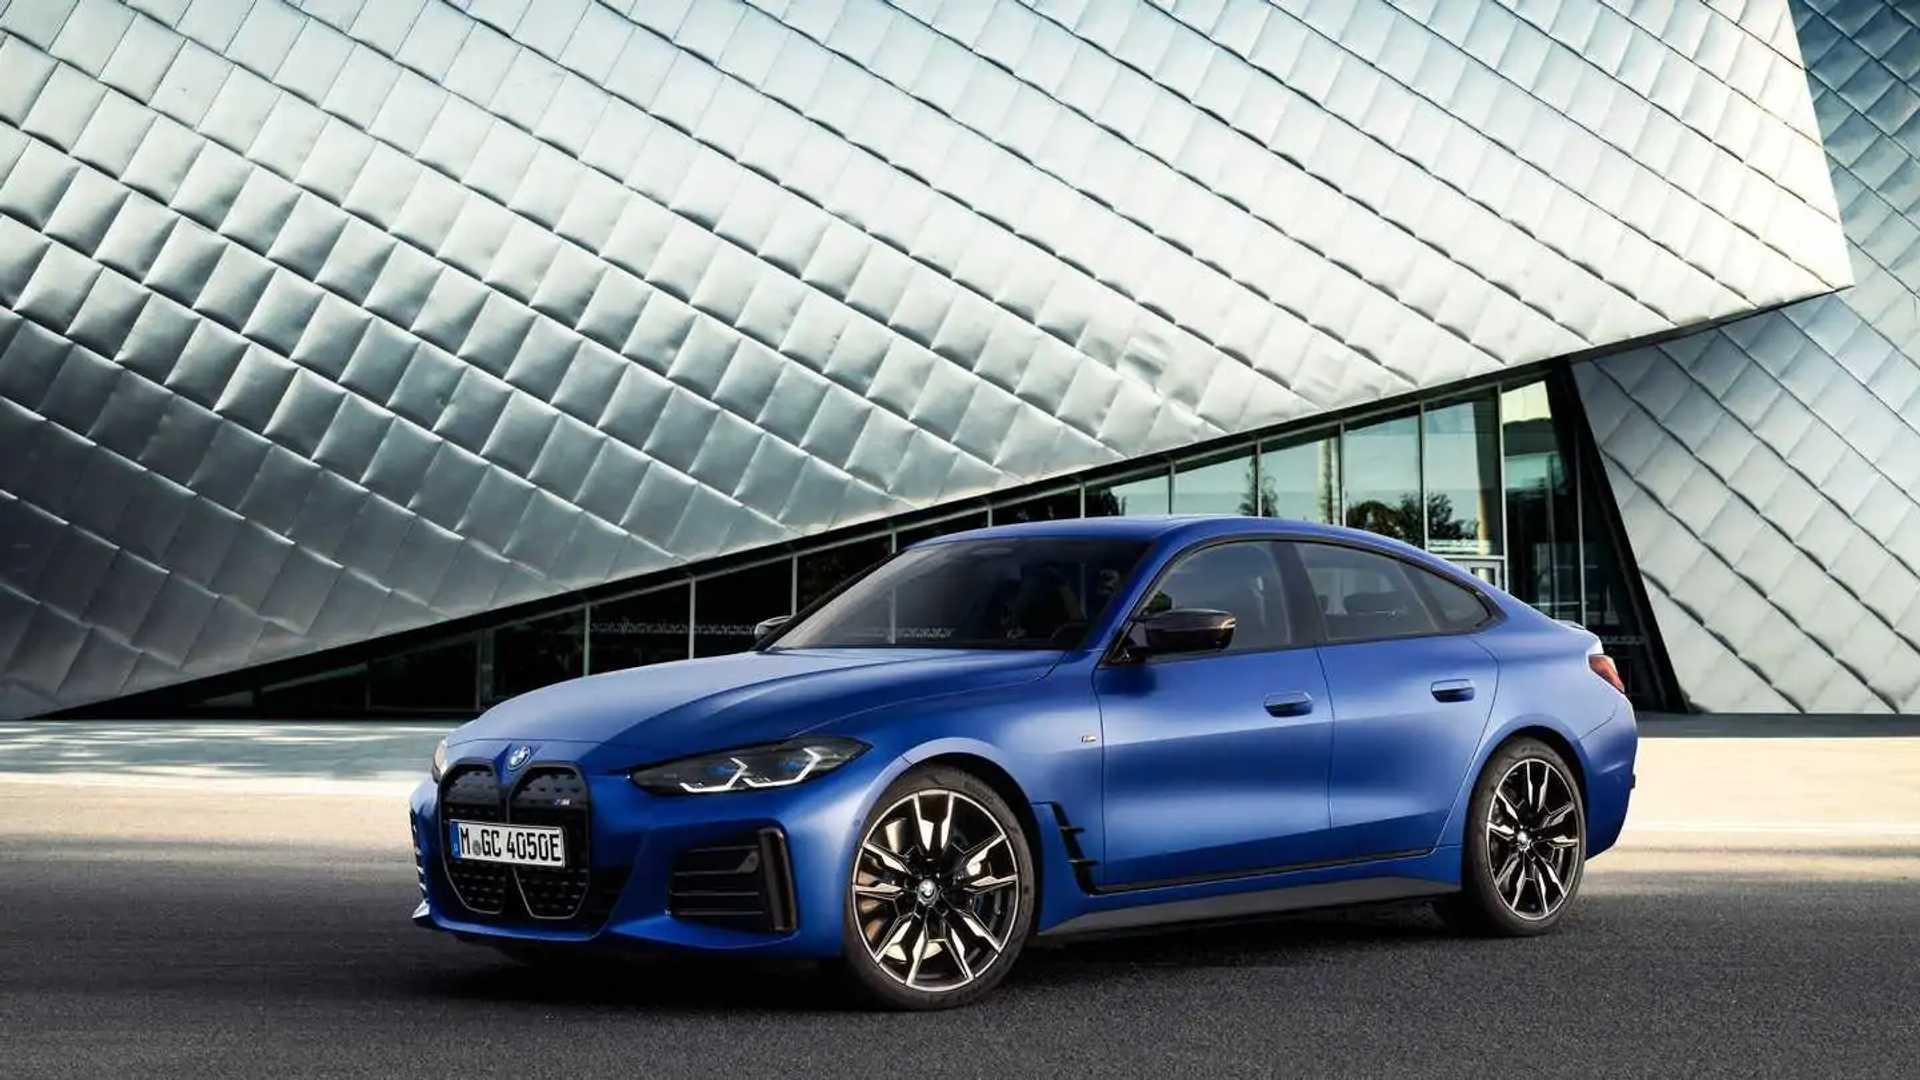 BMW'ye göre elektrikli otomobillere 600 km menzil yeterli!